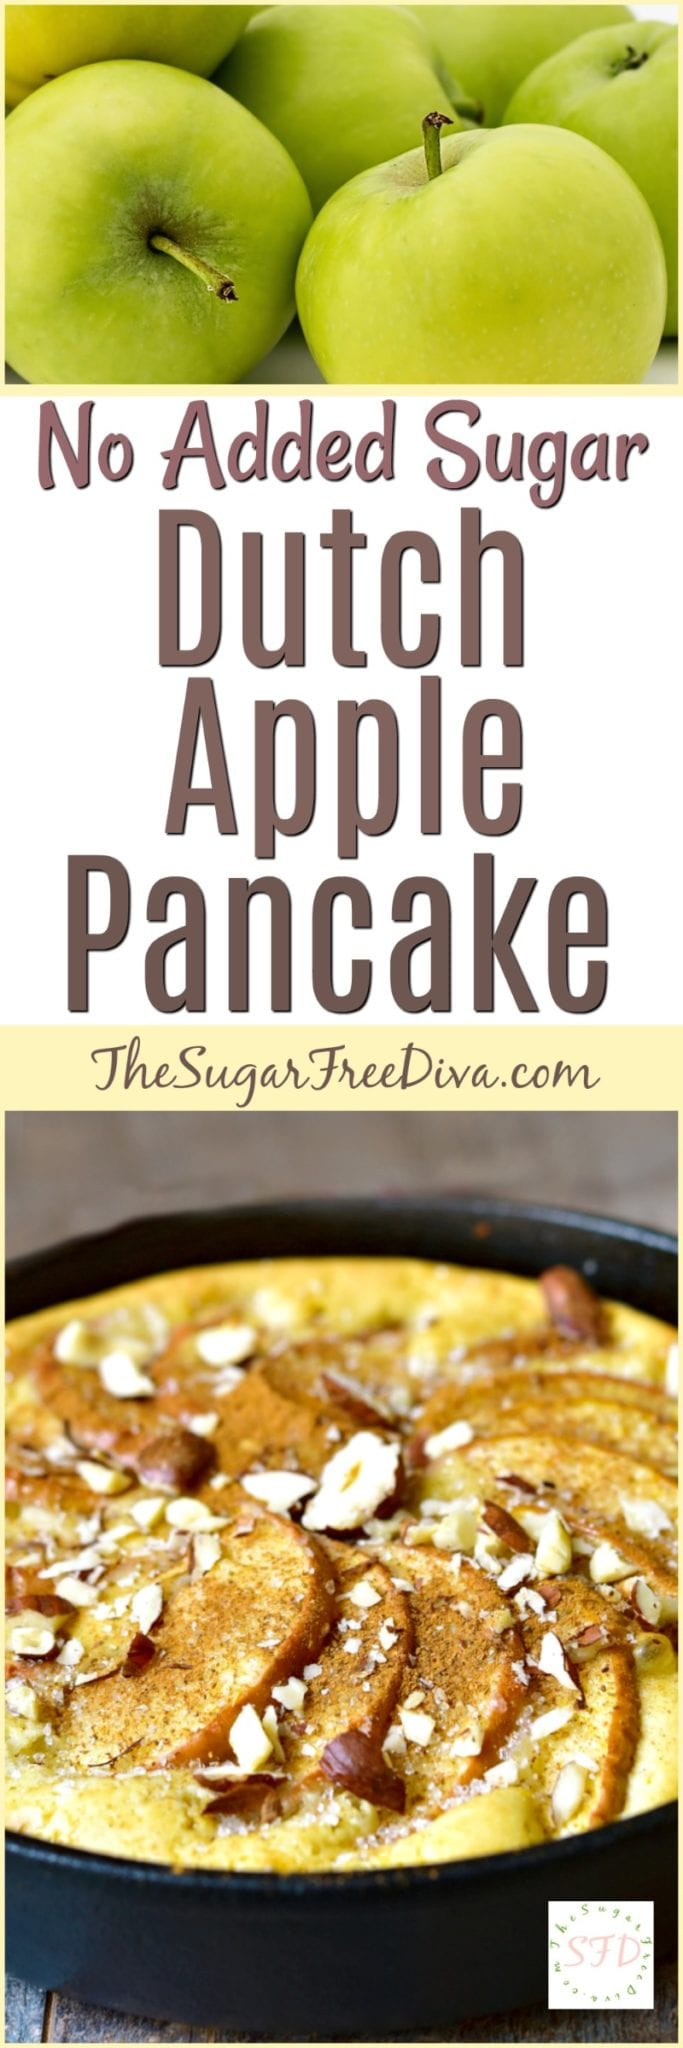 No Sugar Added Delicious Dutch Apple Pancake Recipe